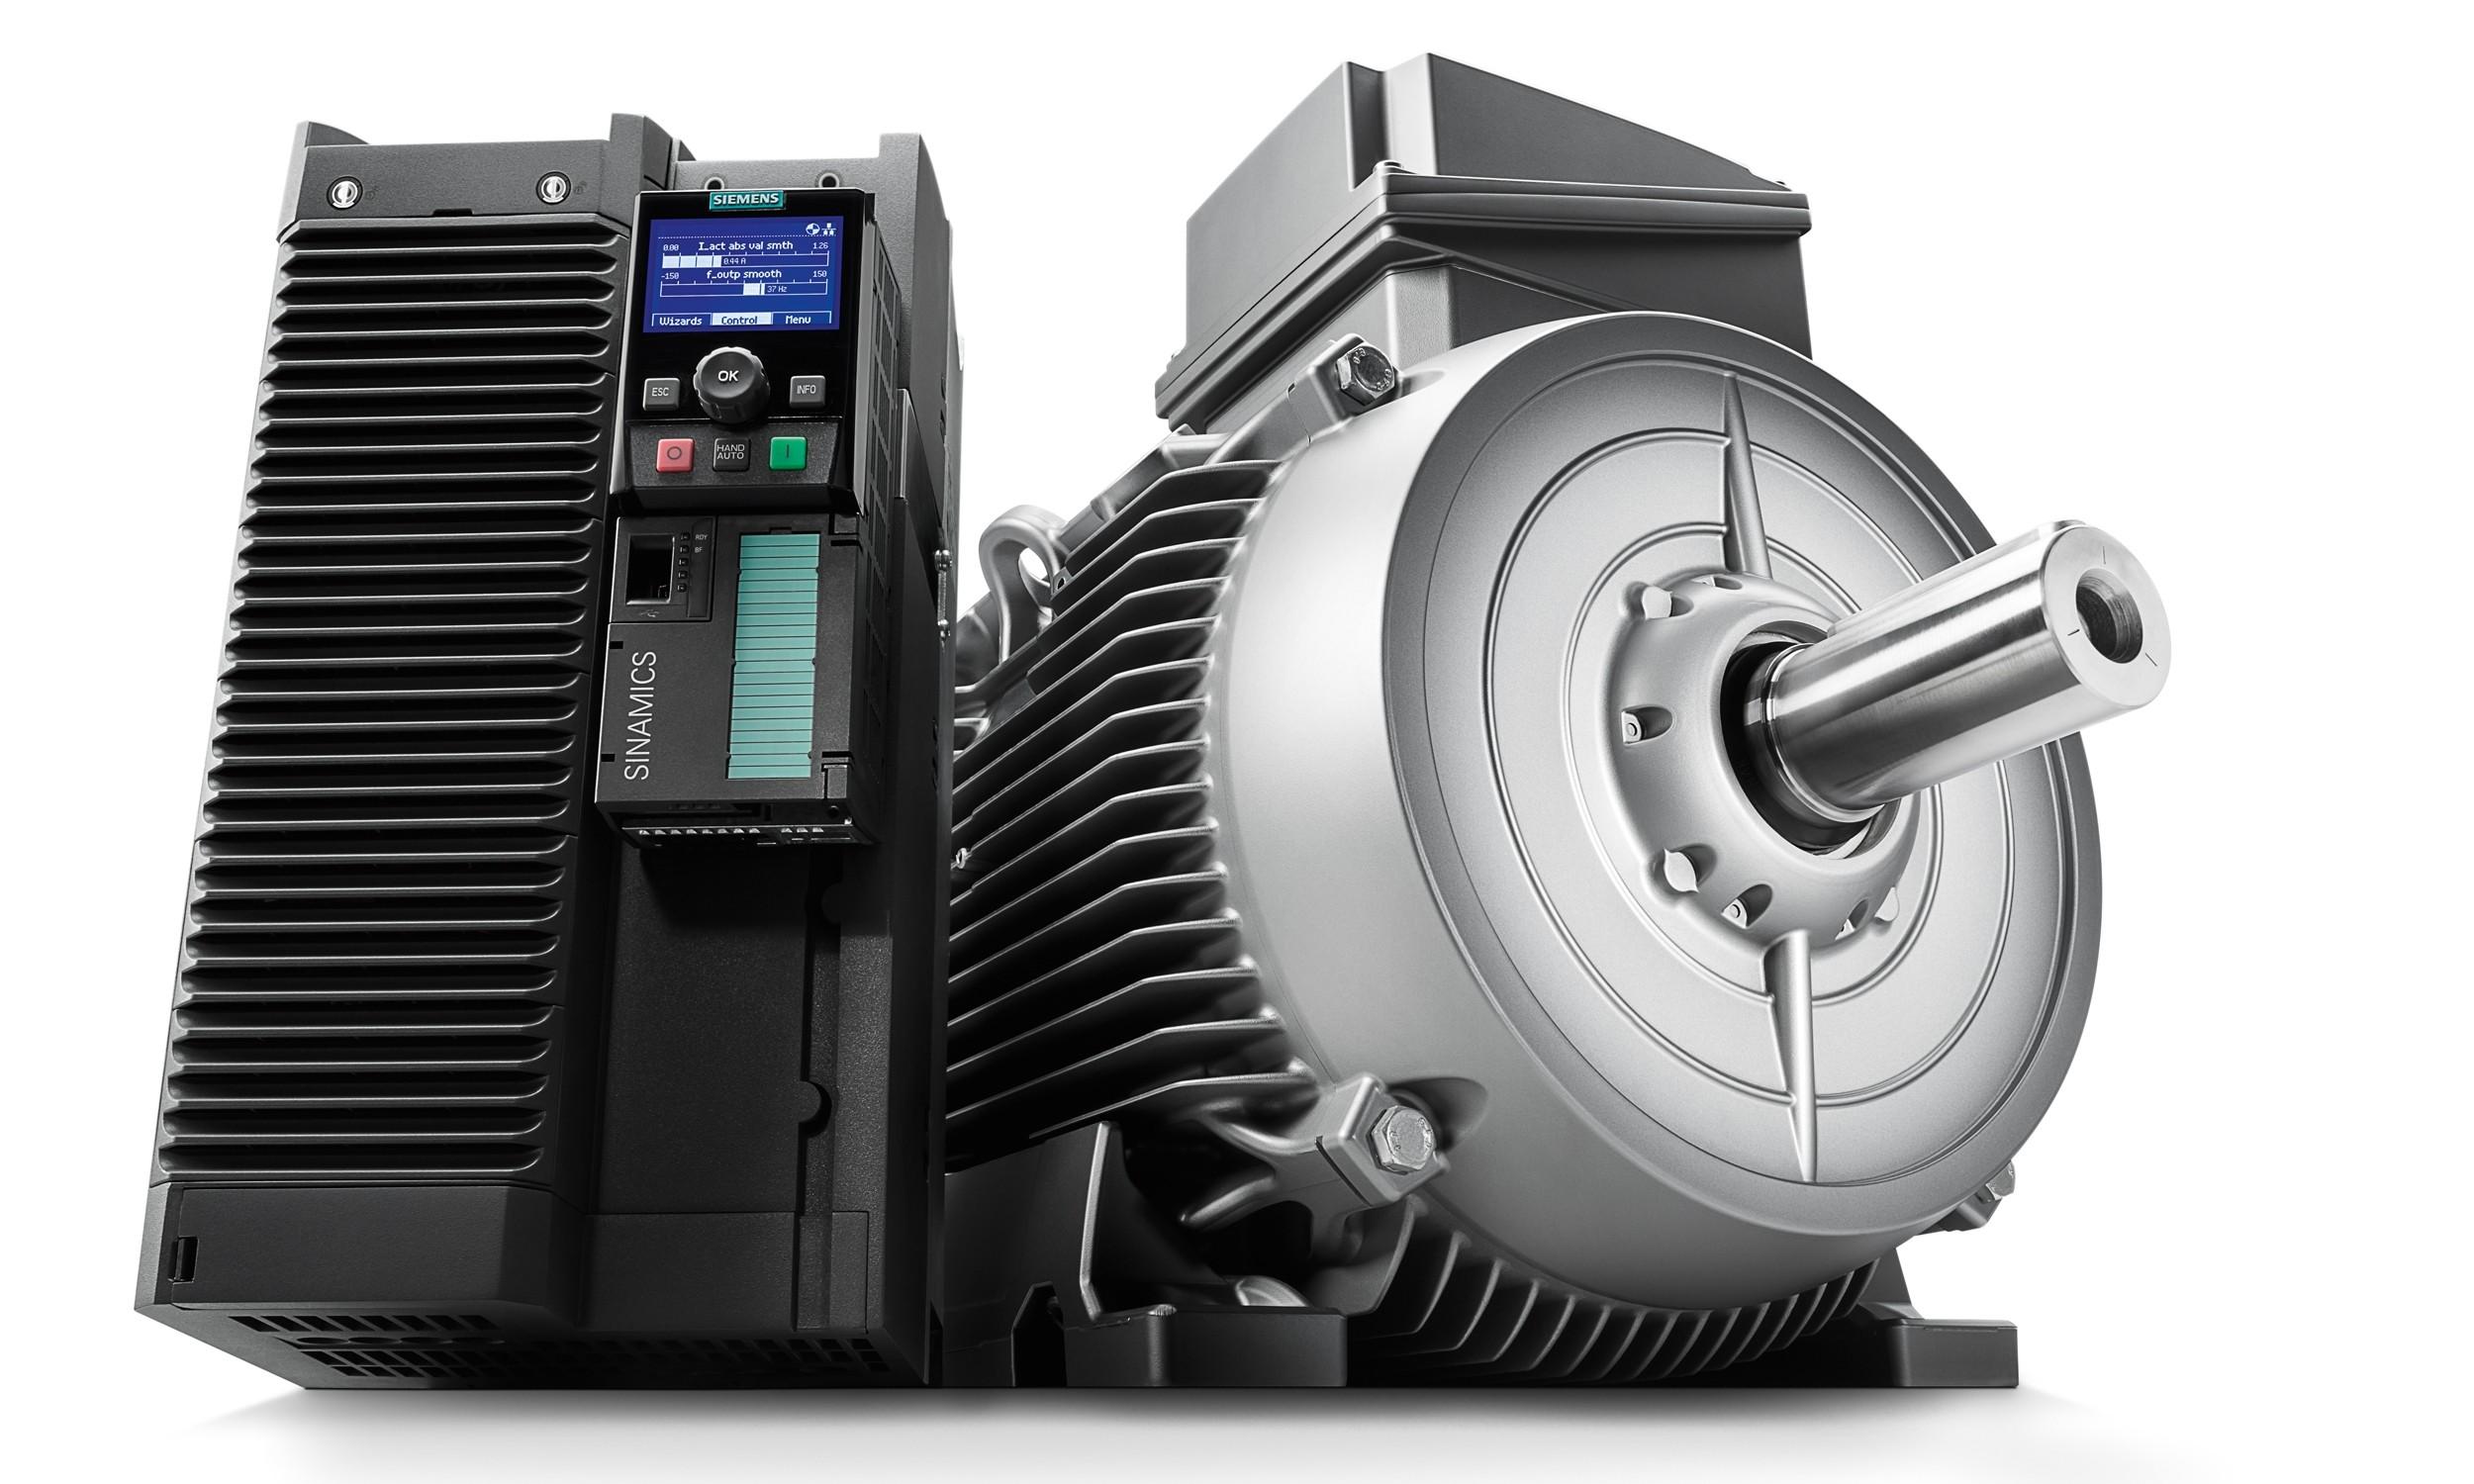 pd-vsd4000-antriebssystem-style-2-iso2.jpeg